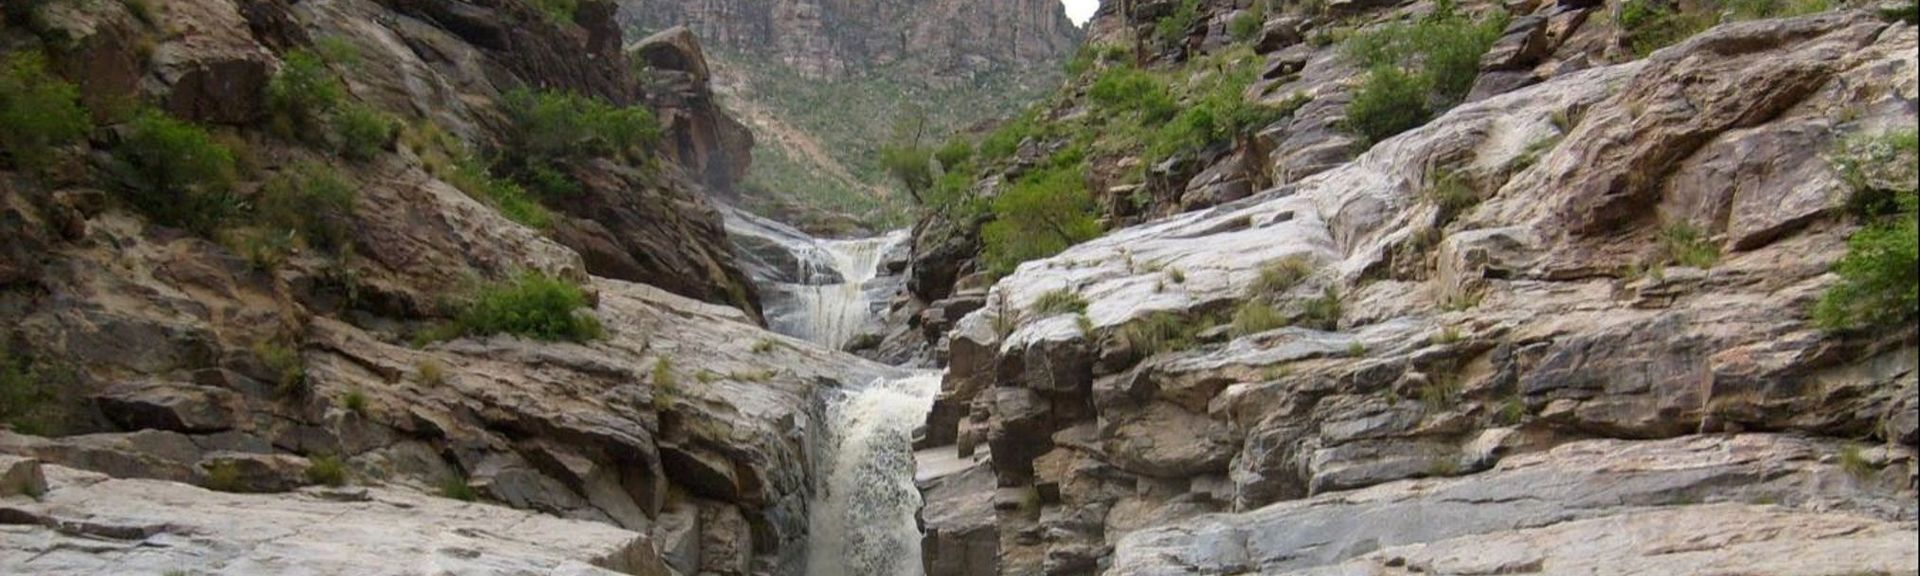 Ventana Canyon (Tucson, Arizona, USA)